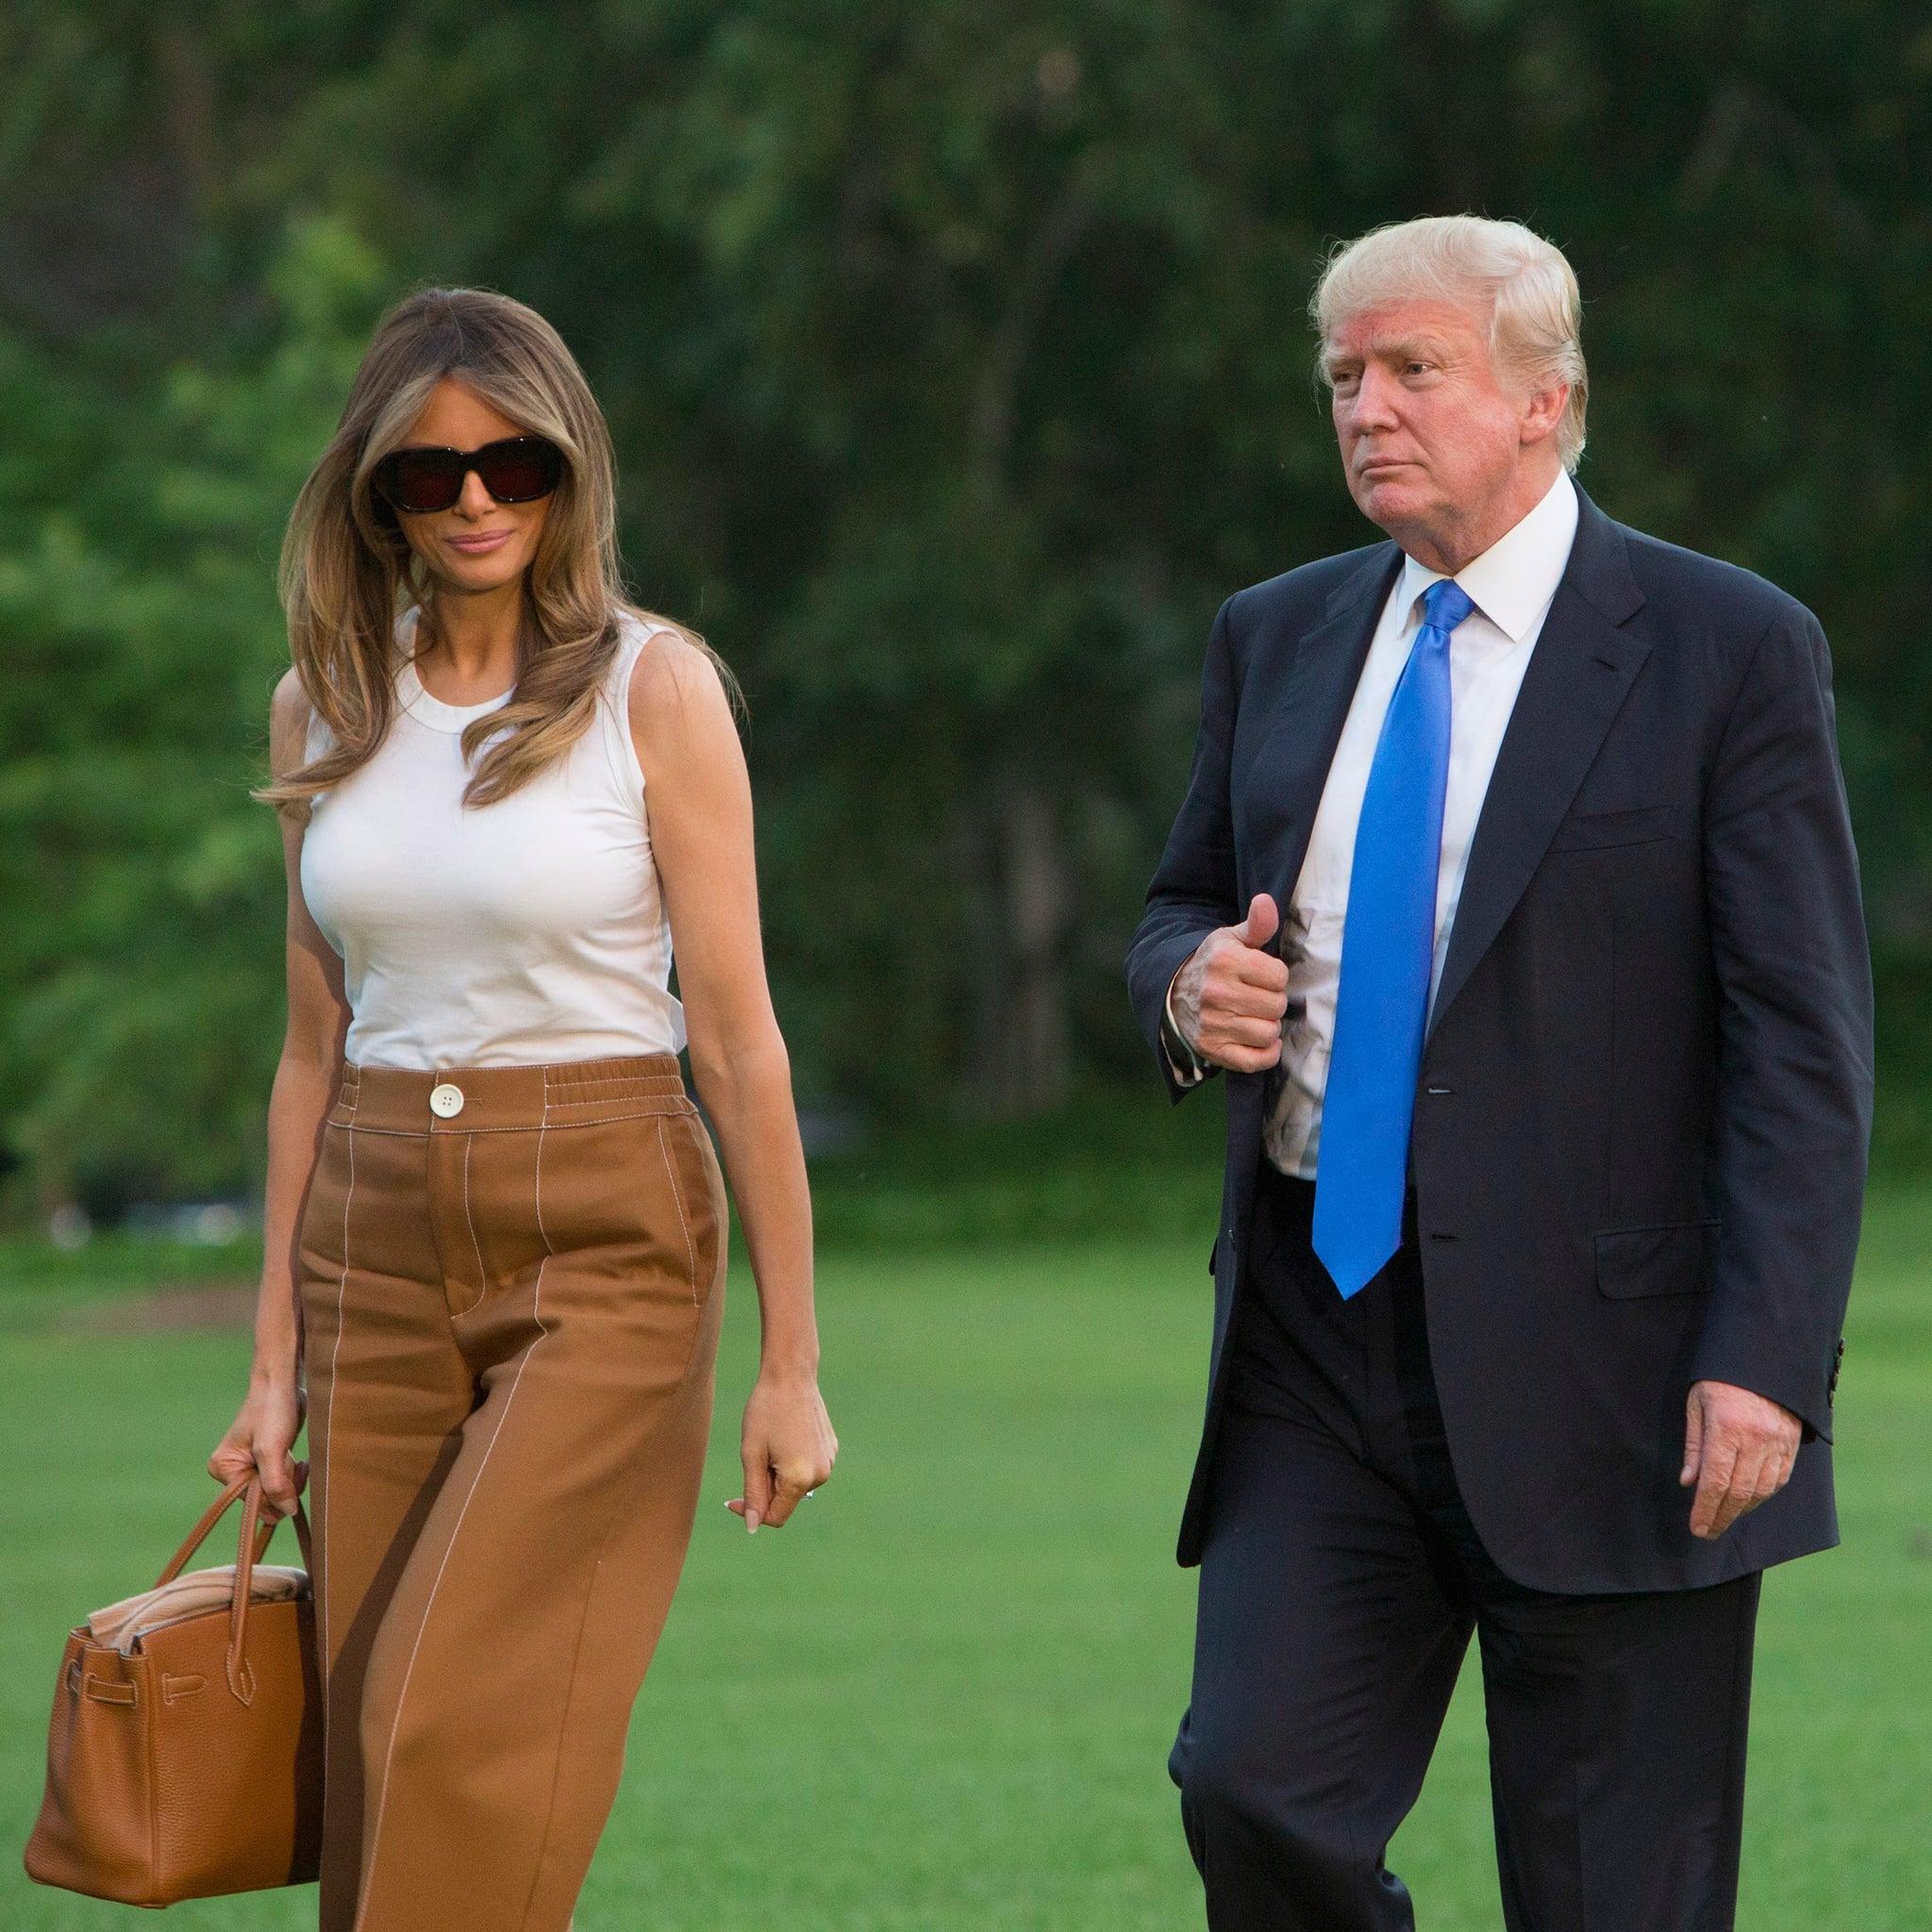 eee9826f0a Melania Trump Bally Pants at the White House